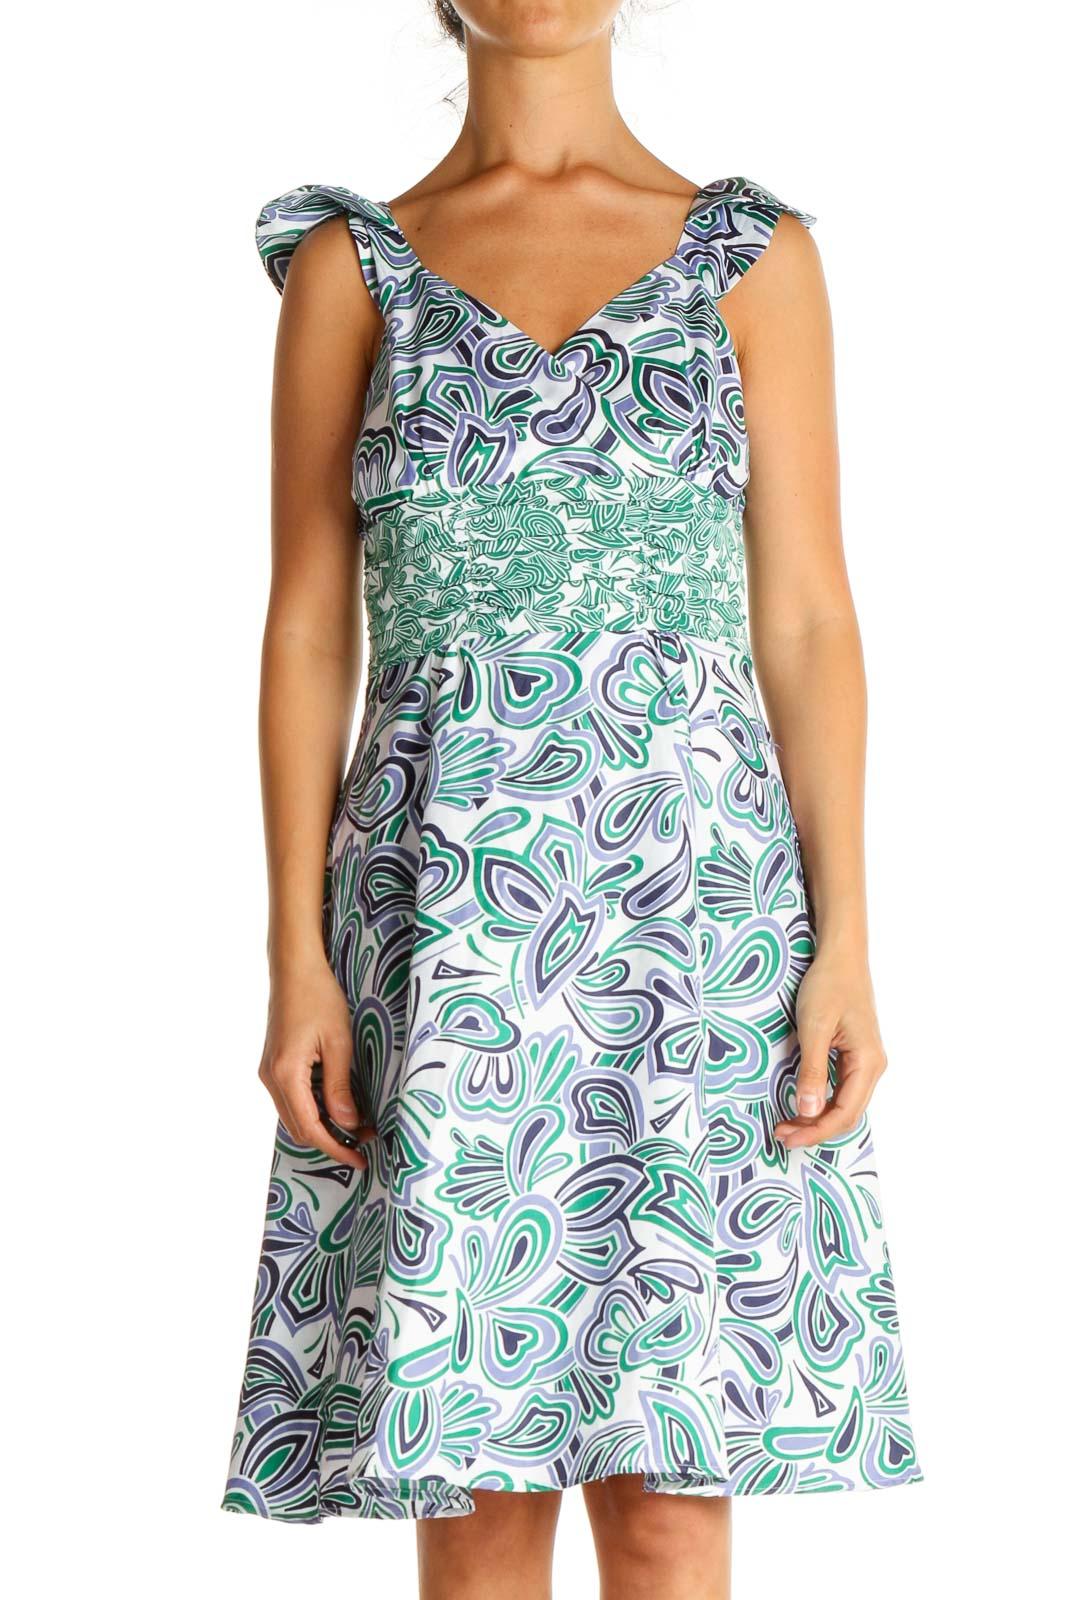 Blue Paisley Bohemian Fit & Flare Dress Front